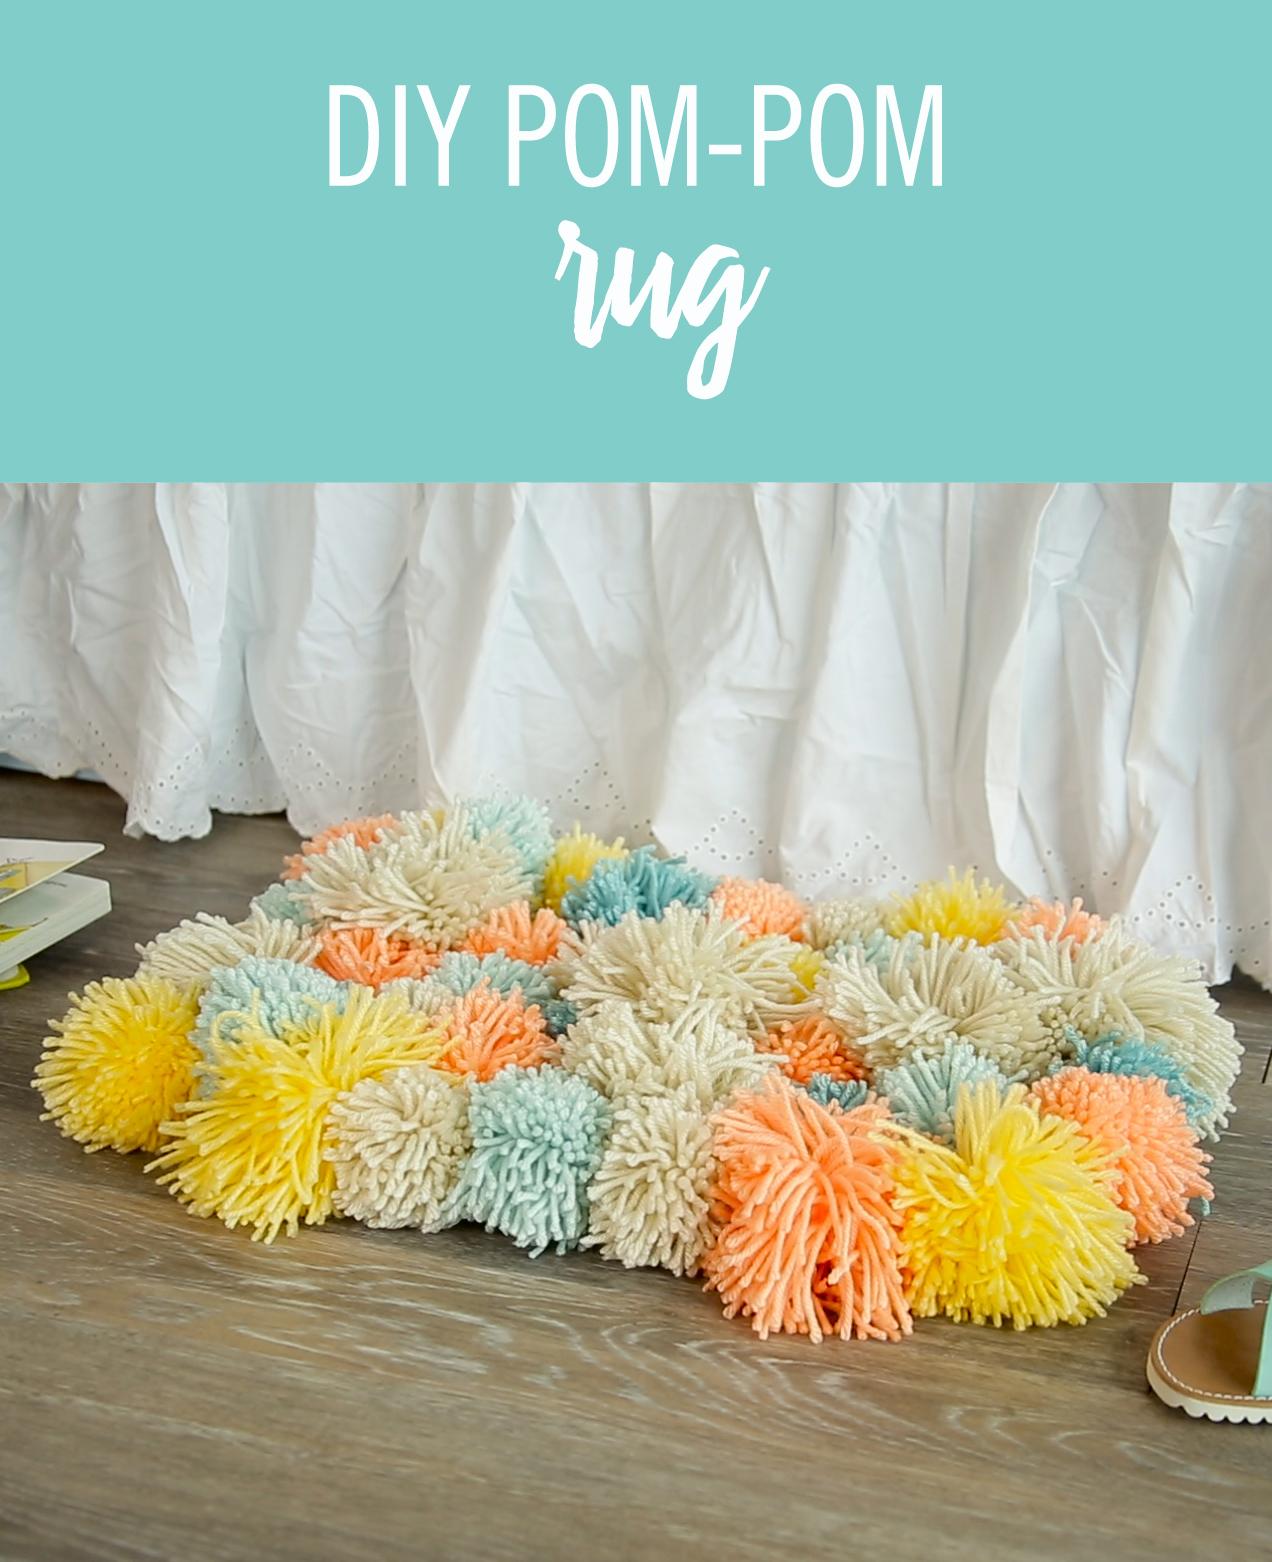 7 No Knit Yarn Projects